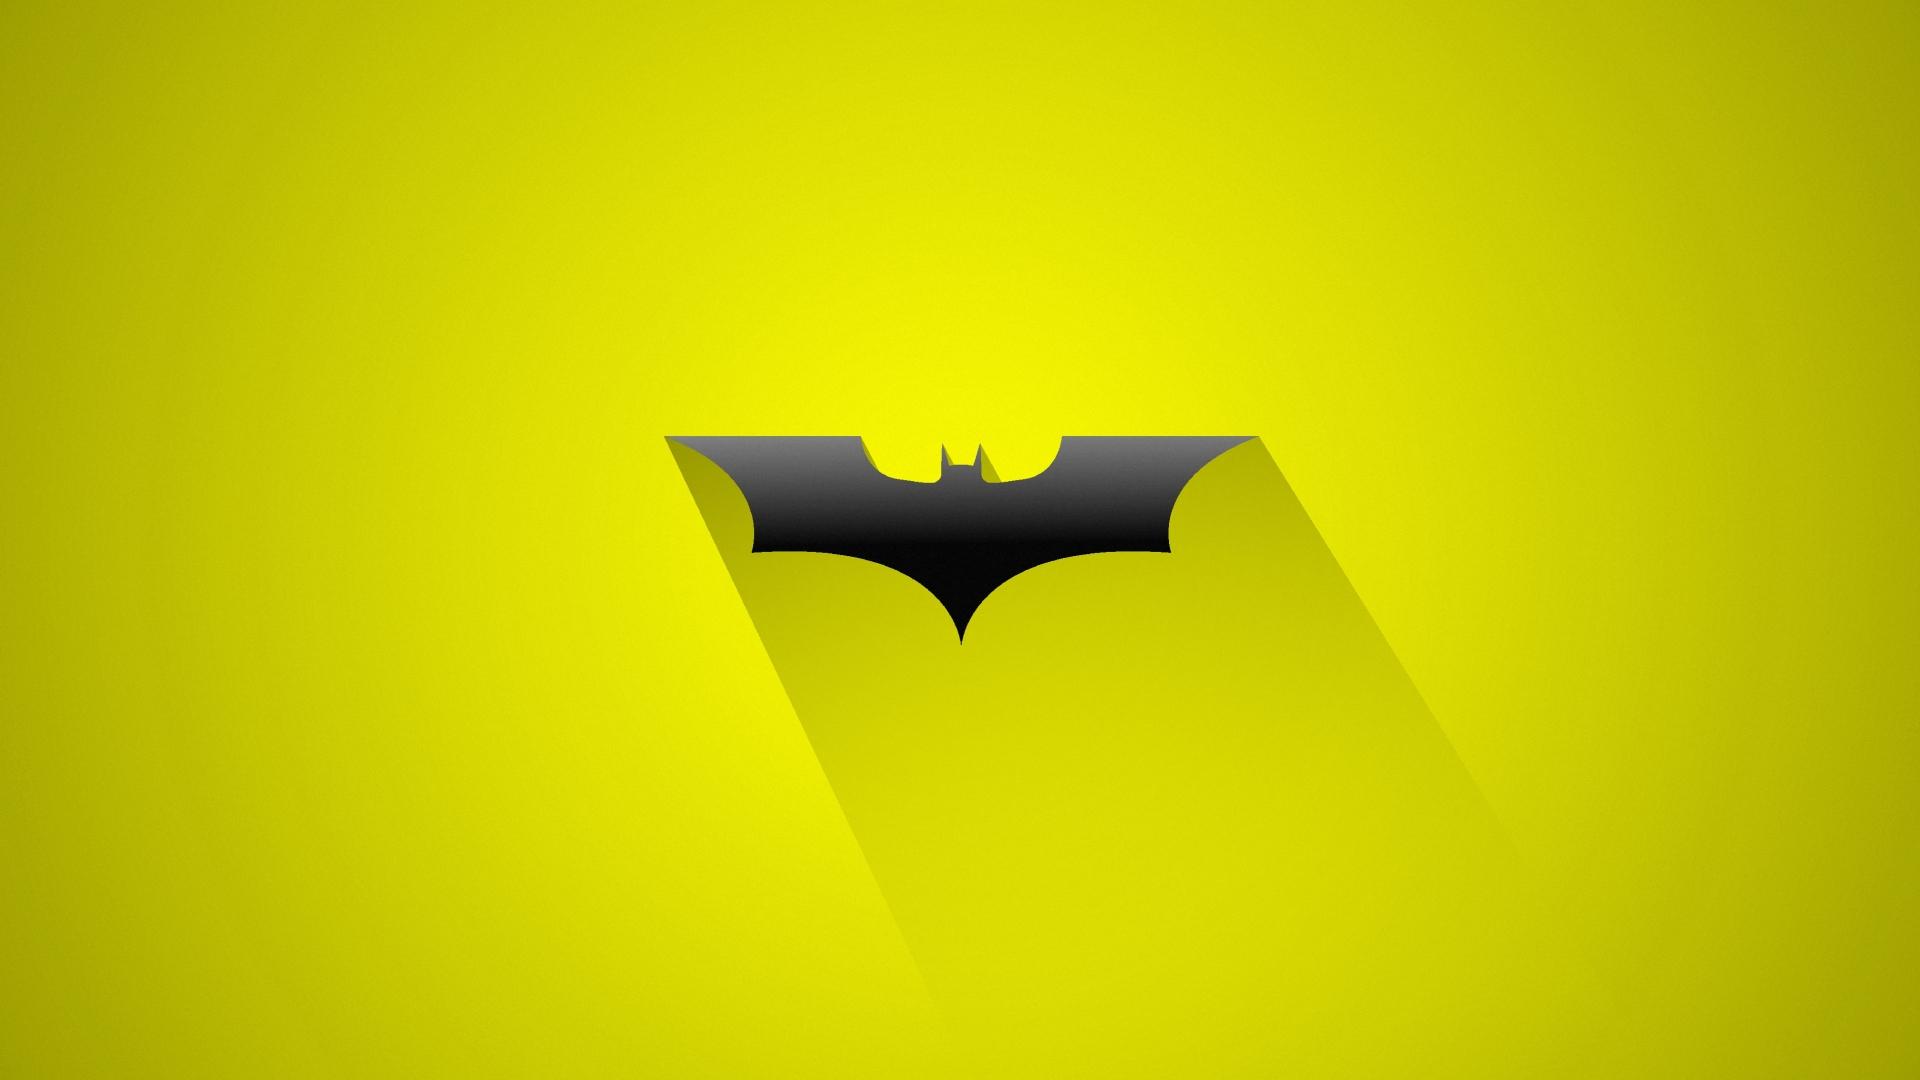 1920x1080 Batman 8k Logo 1080p Laptop Full Hd Wallpaper Hd